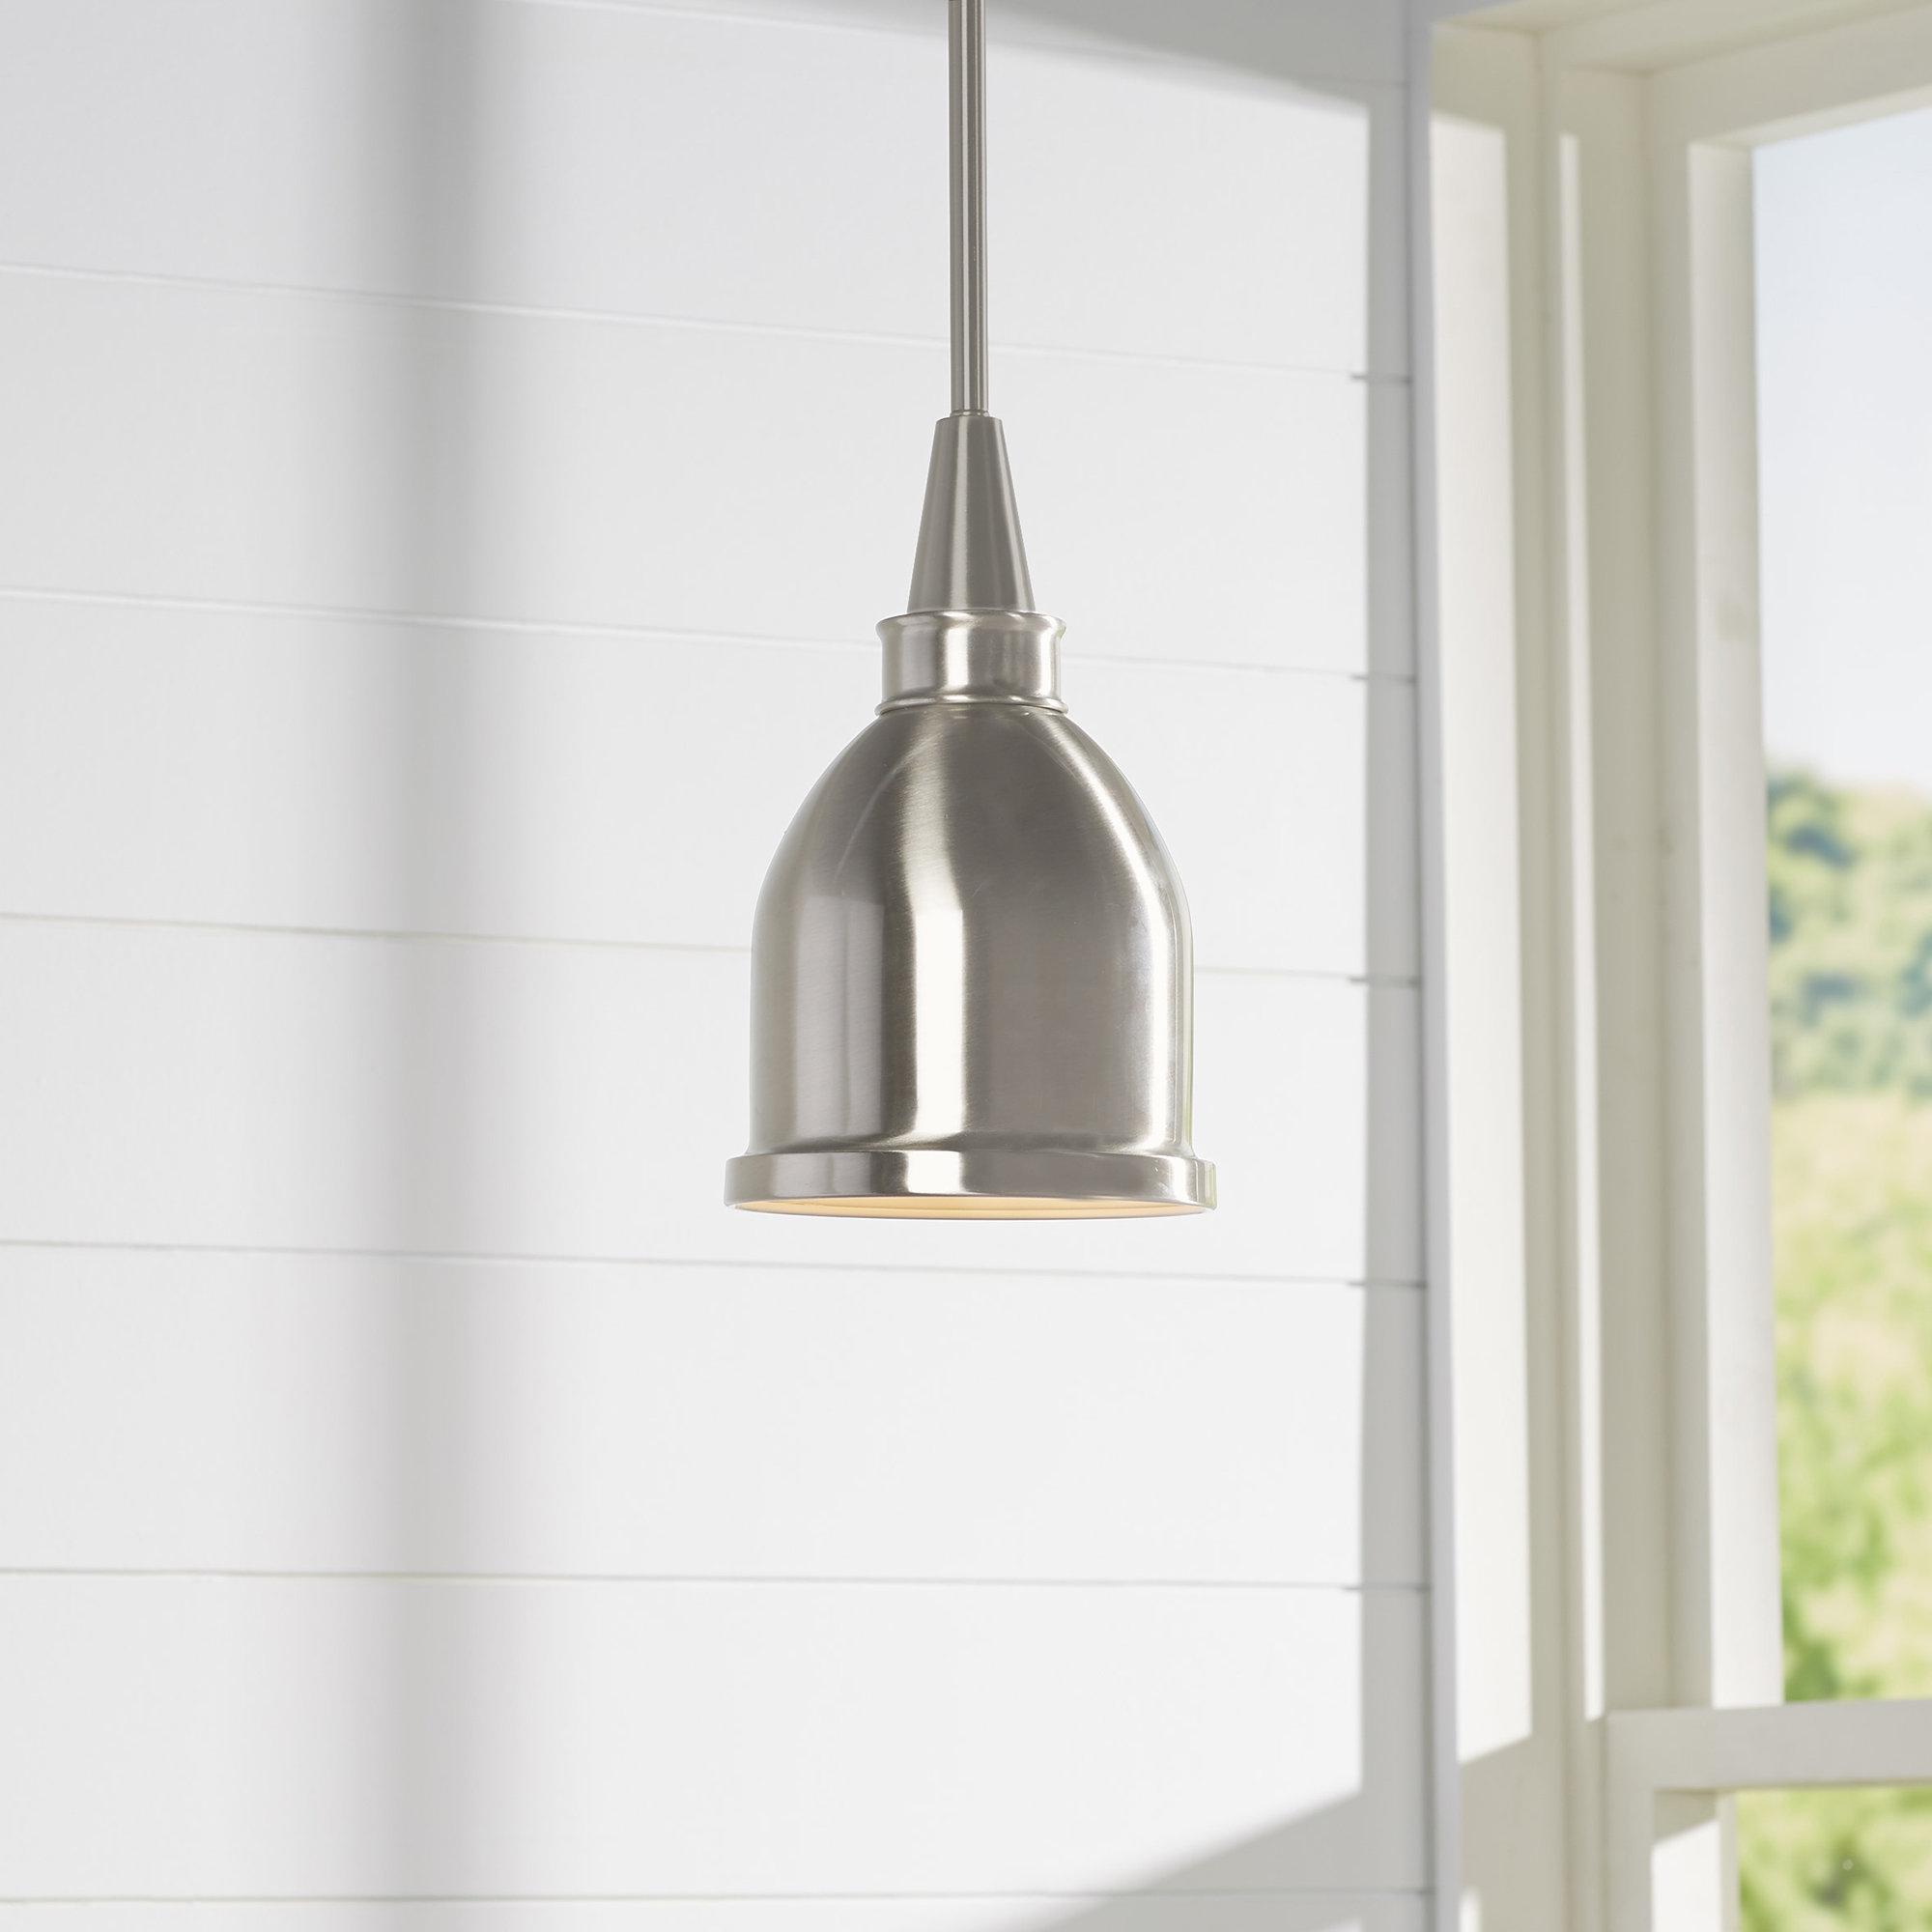 Manston 1 Light Single Bell Pendant Throughout 2020 Hamilton 1 Light Single Dome Pendants (View 16 of 25)